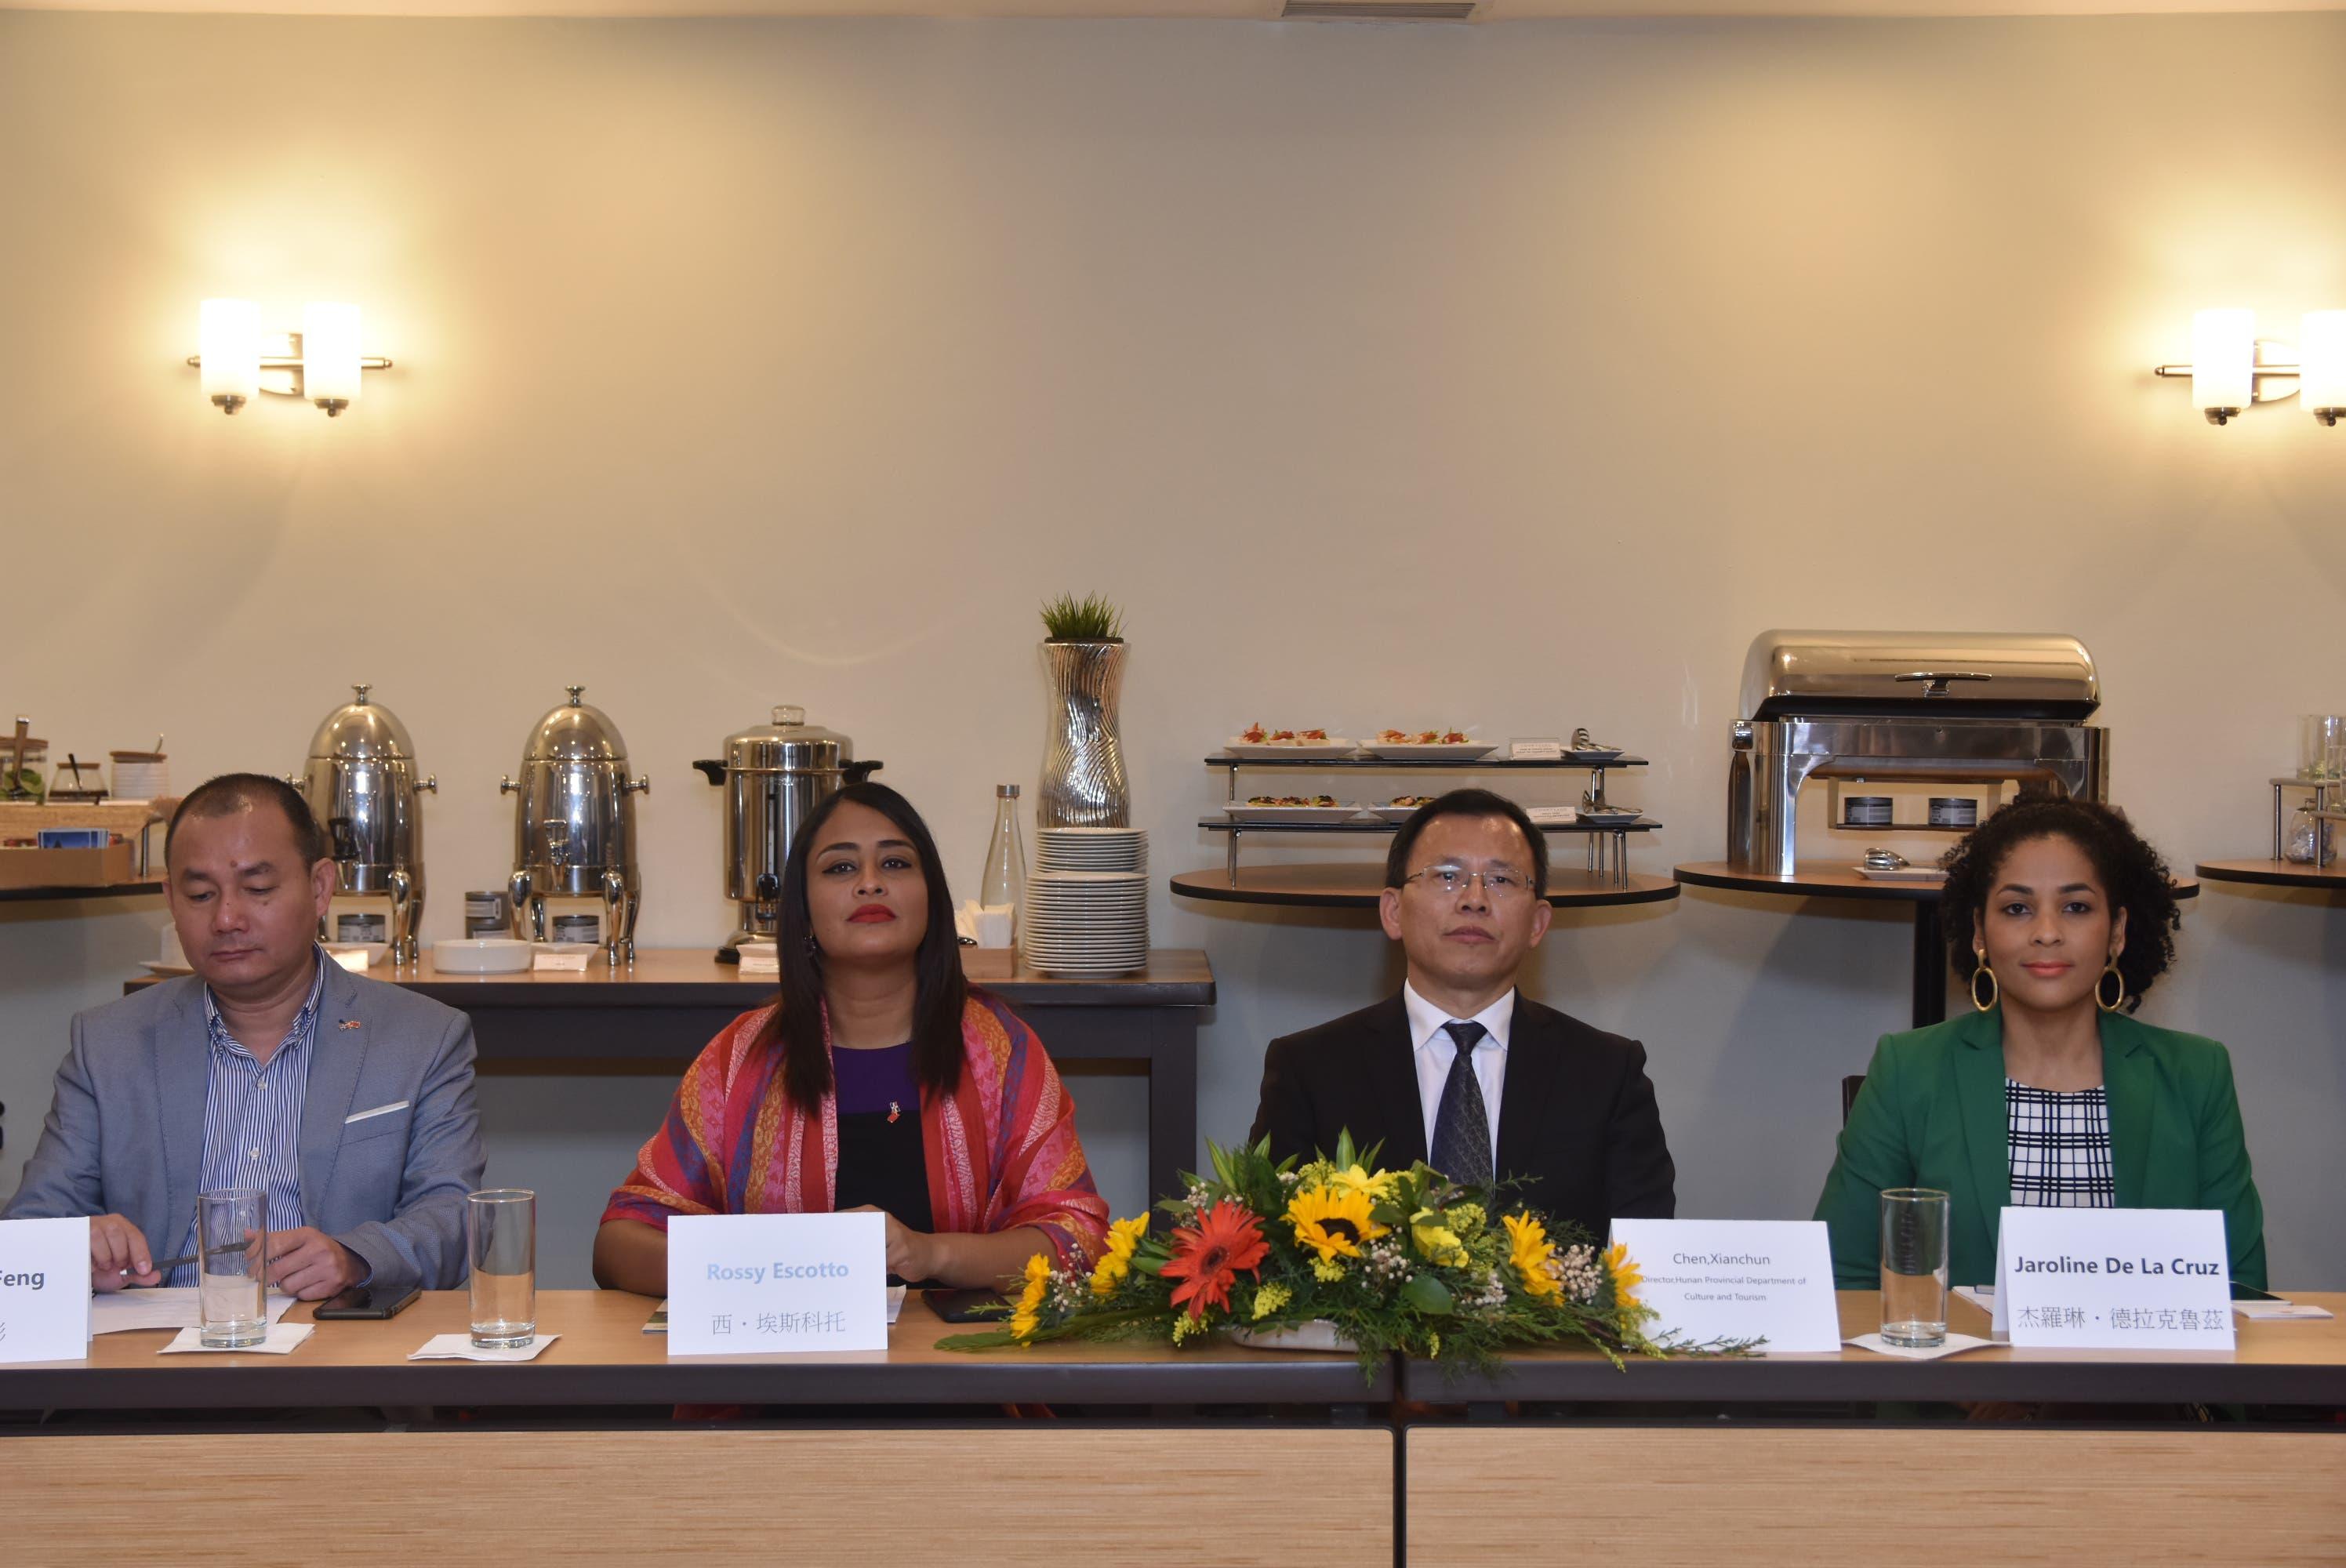 Funcionario turismo chino: Exención visados e interconexión de aerolíneas facilitará intercambio y cooperación